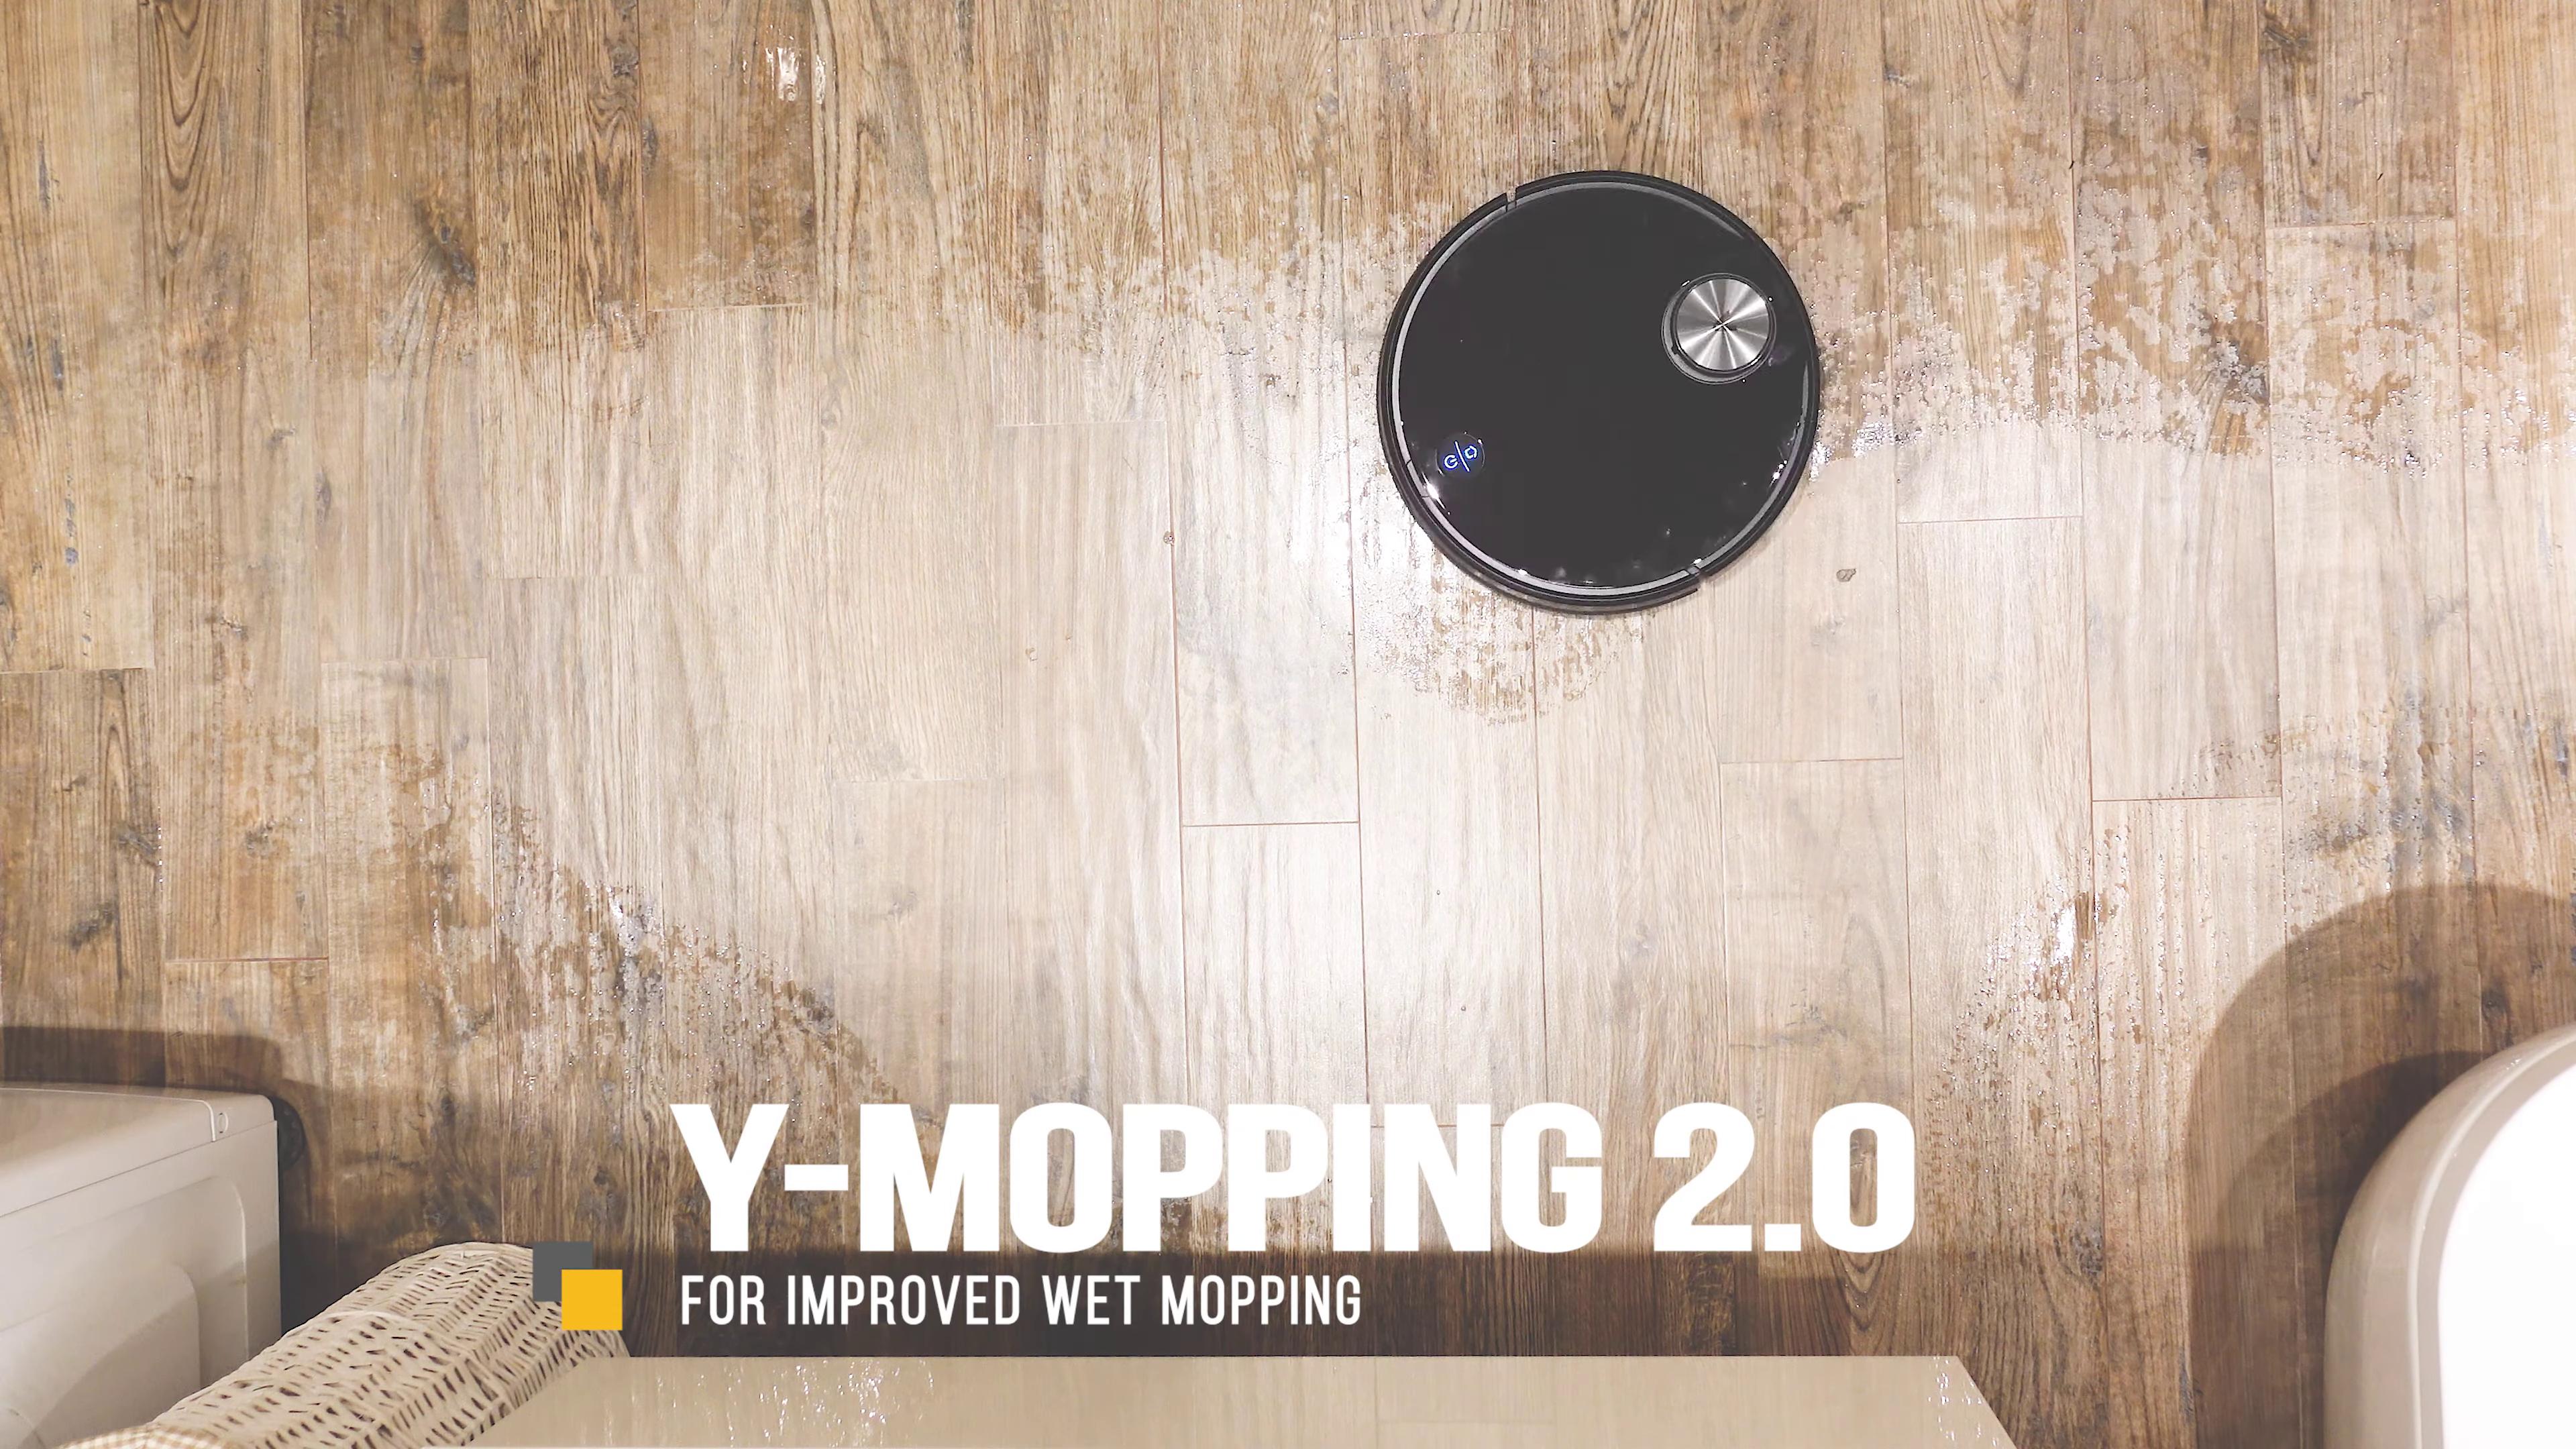 Viomi V3 Y-Mopping 2.0